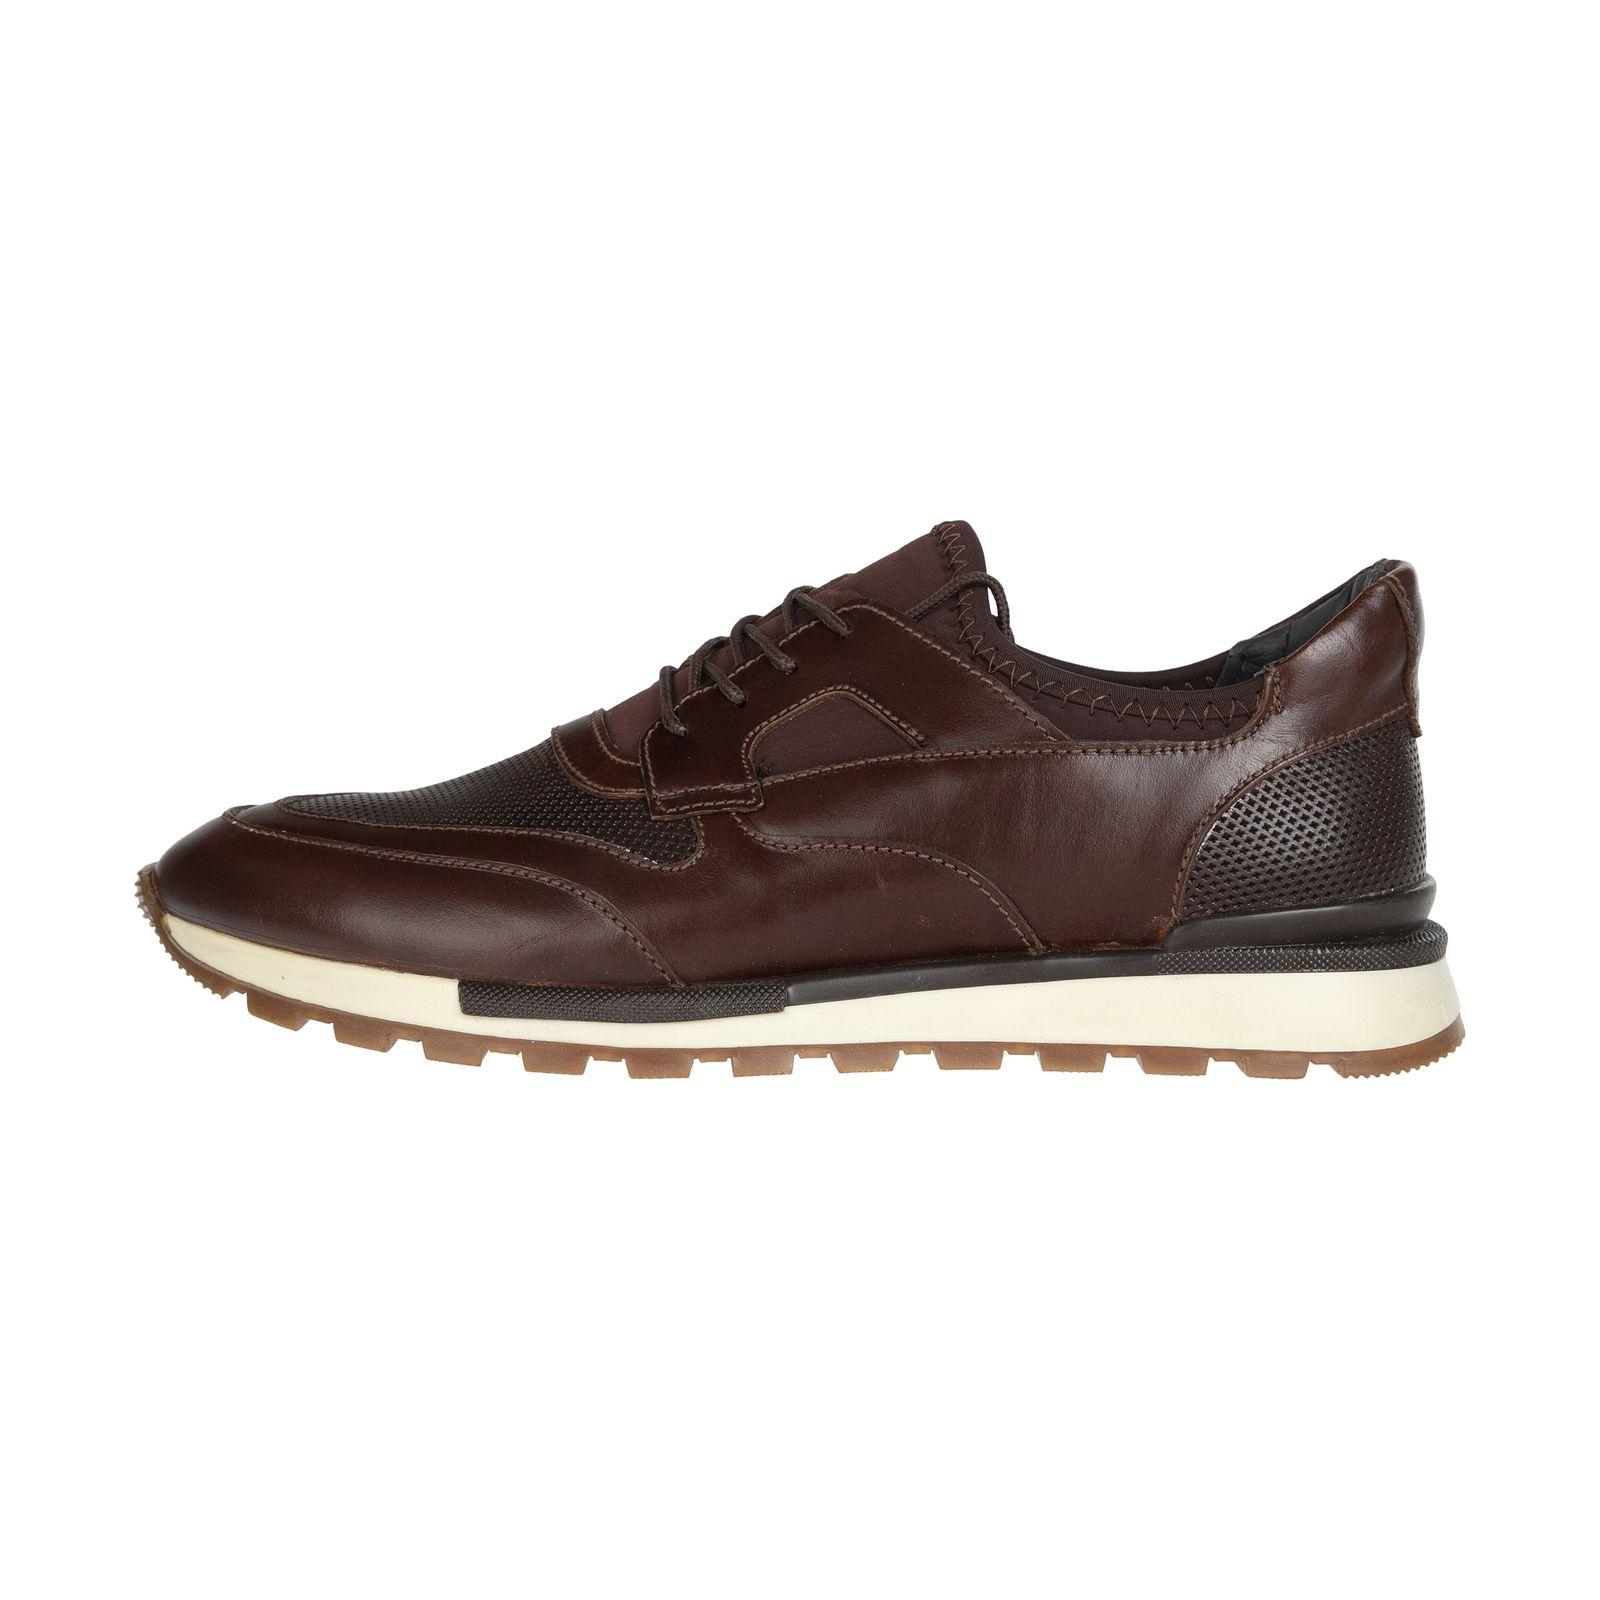 کفش روزمره مردانه دلفارد مدل 8374A503104 -  - 2